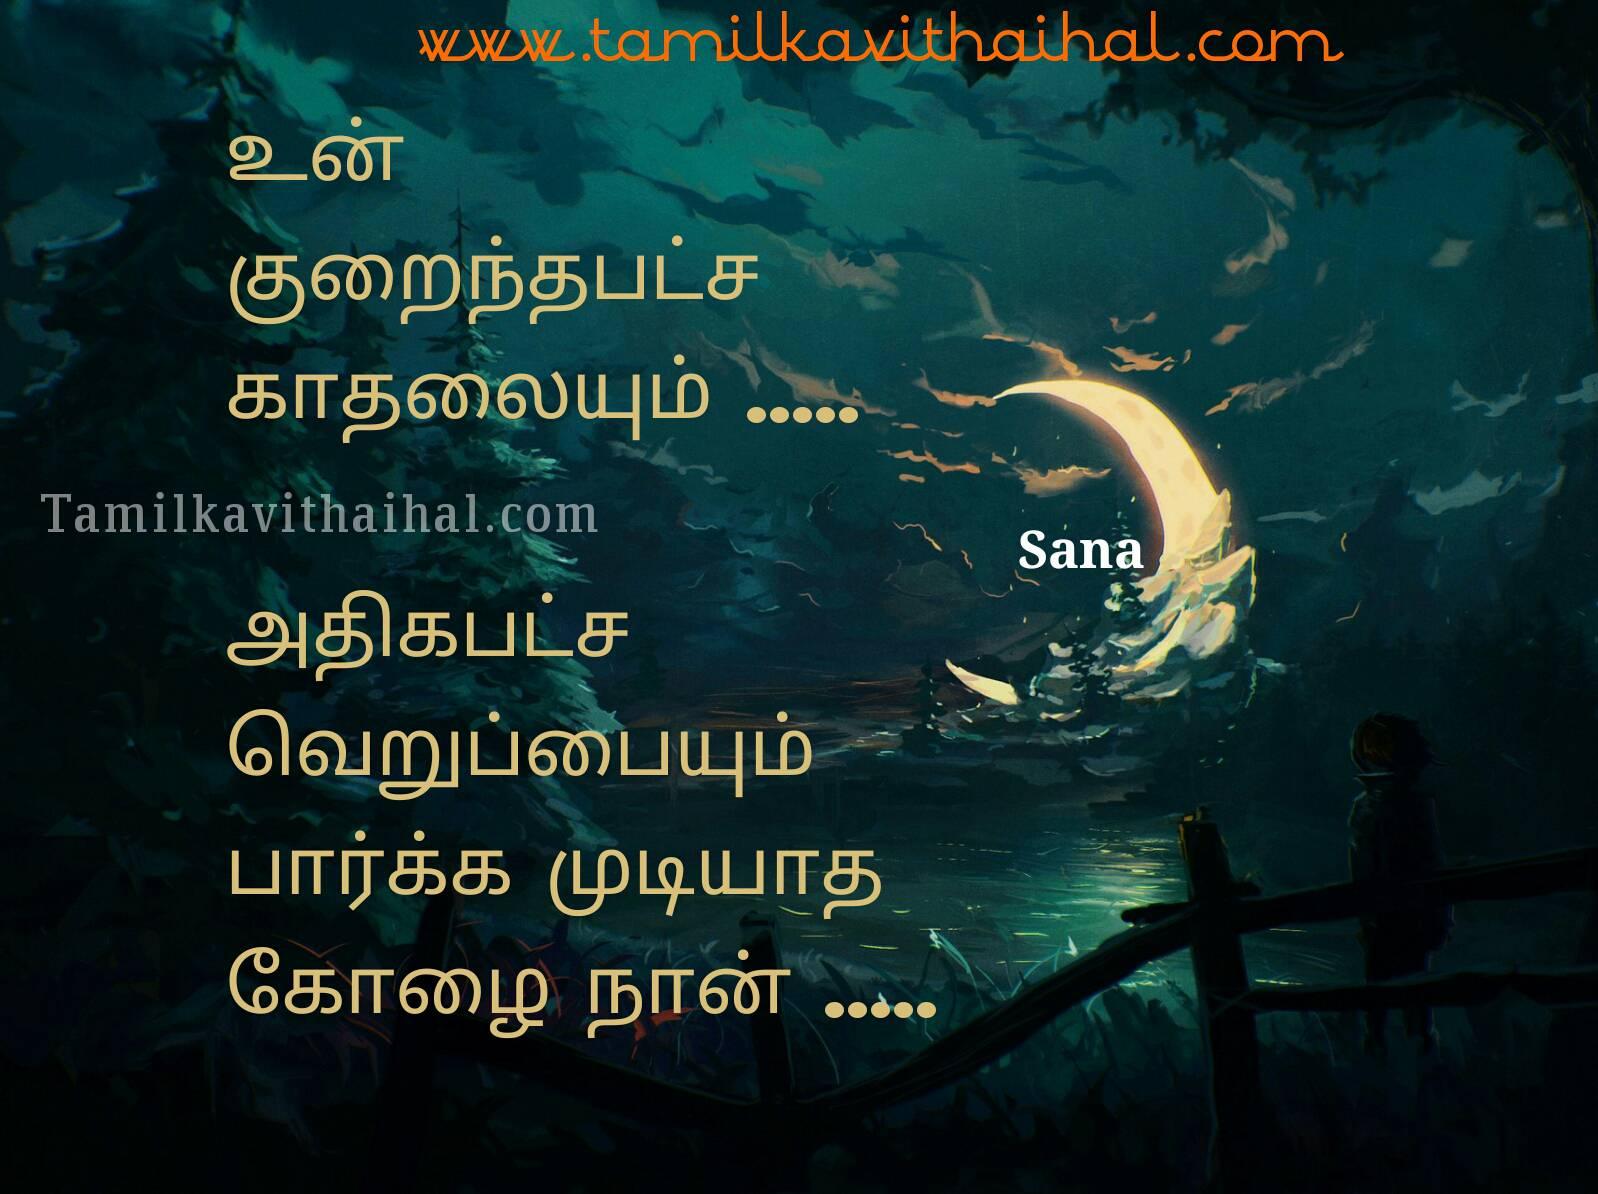 Beautiful kanneer kavithai kadhal veruppu kolai boy girl feel love failure tamil poems lyrics sana image